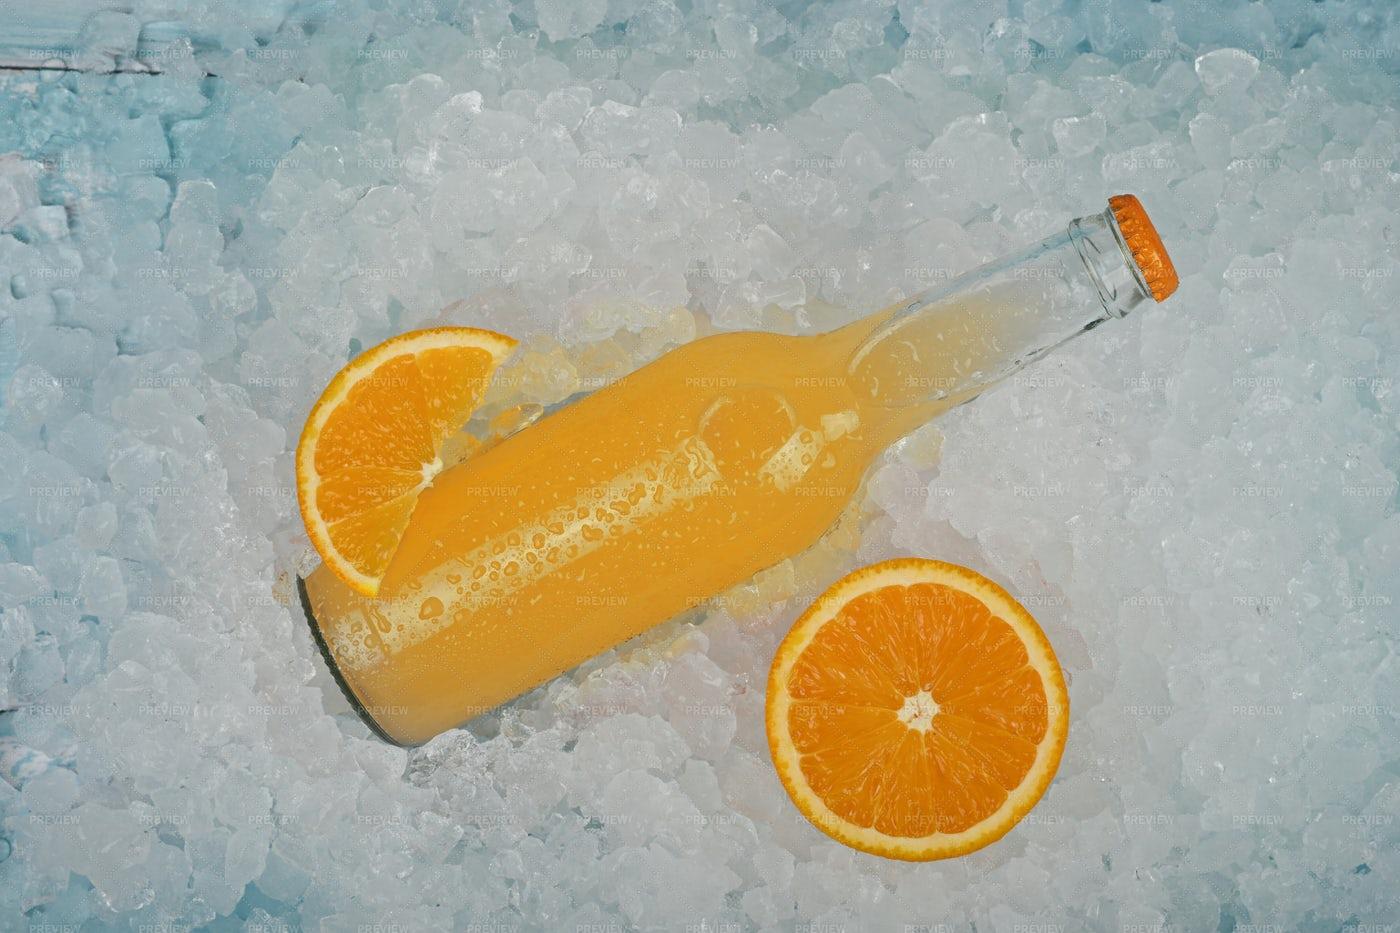 Orange Drink On Ice: Stock Photos